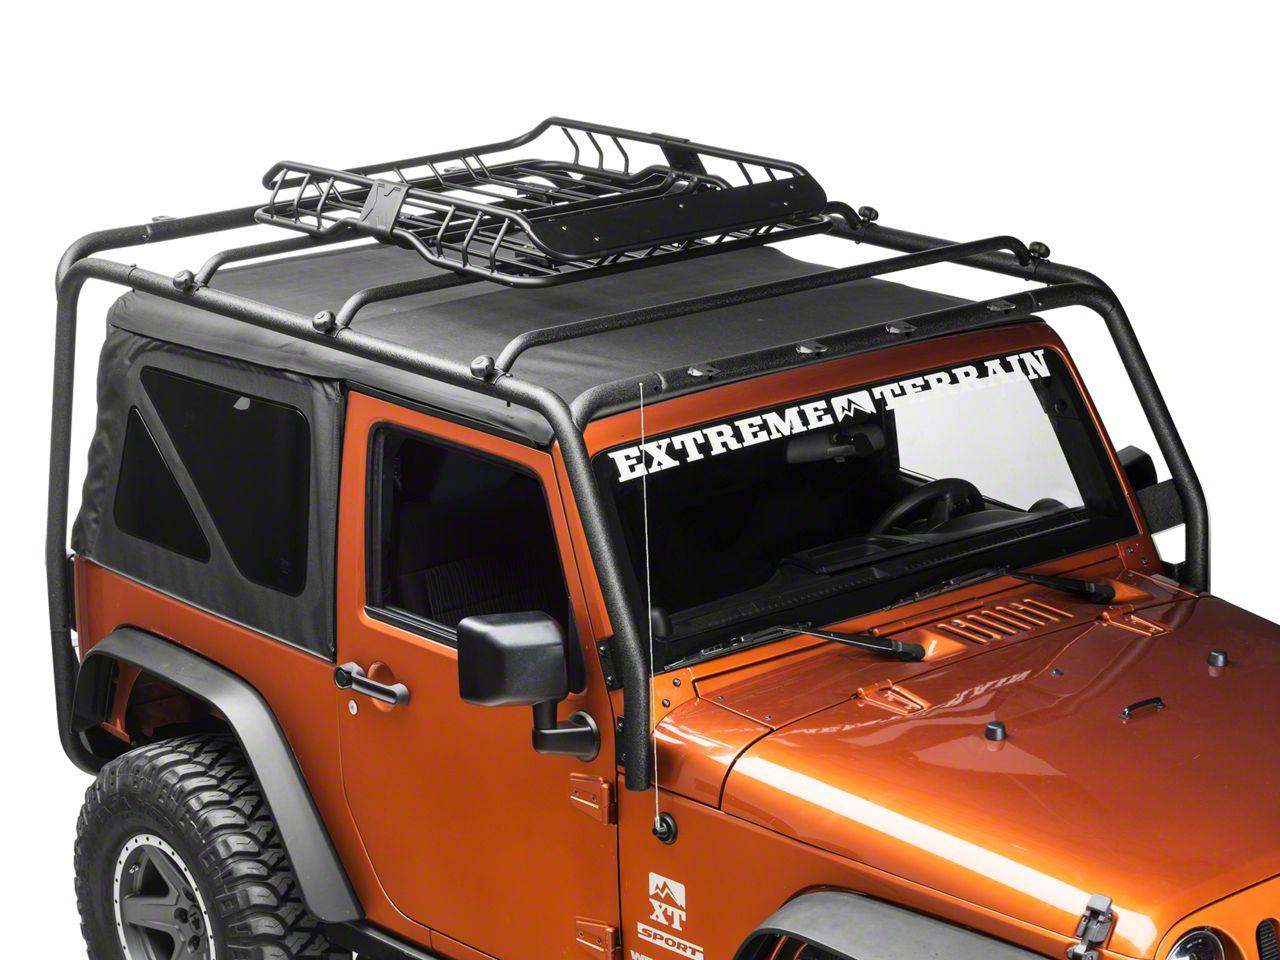 Barricade Jeep Wrangler X Tray Roof Rack Basket J103946 87 21 Jeep Wrangler Yj Tj Jk Jl